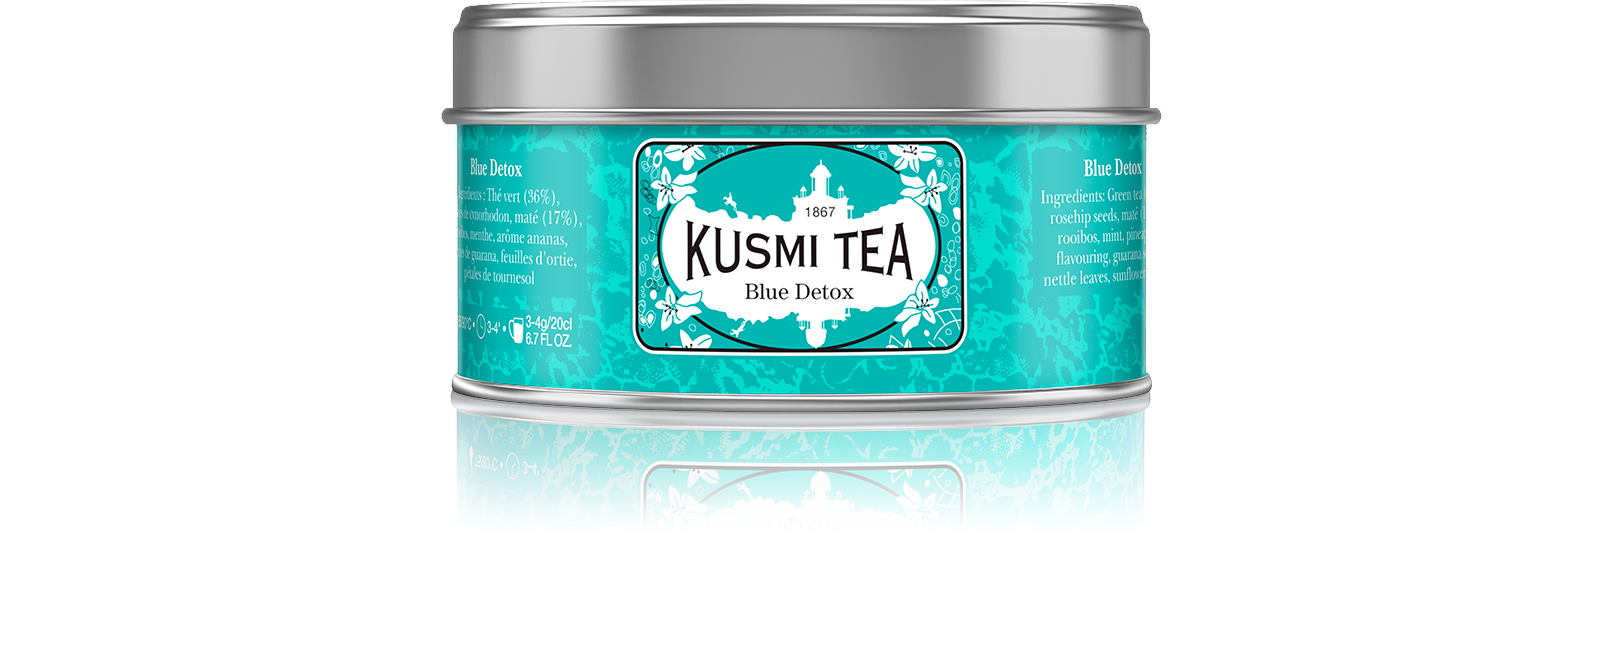 Thé vert, maté, rooibos - Blue Detox - Kusmi Tea